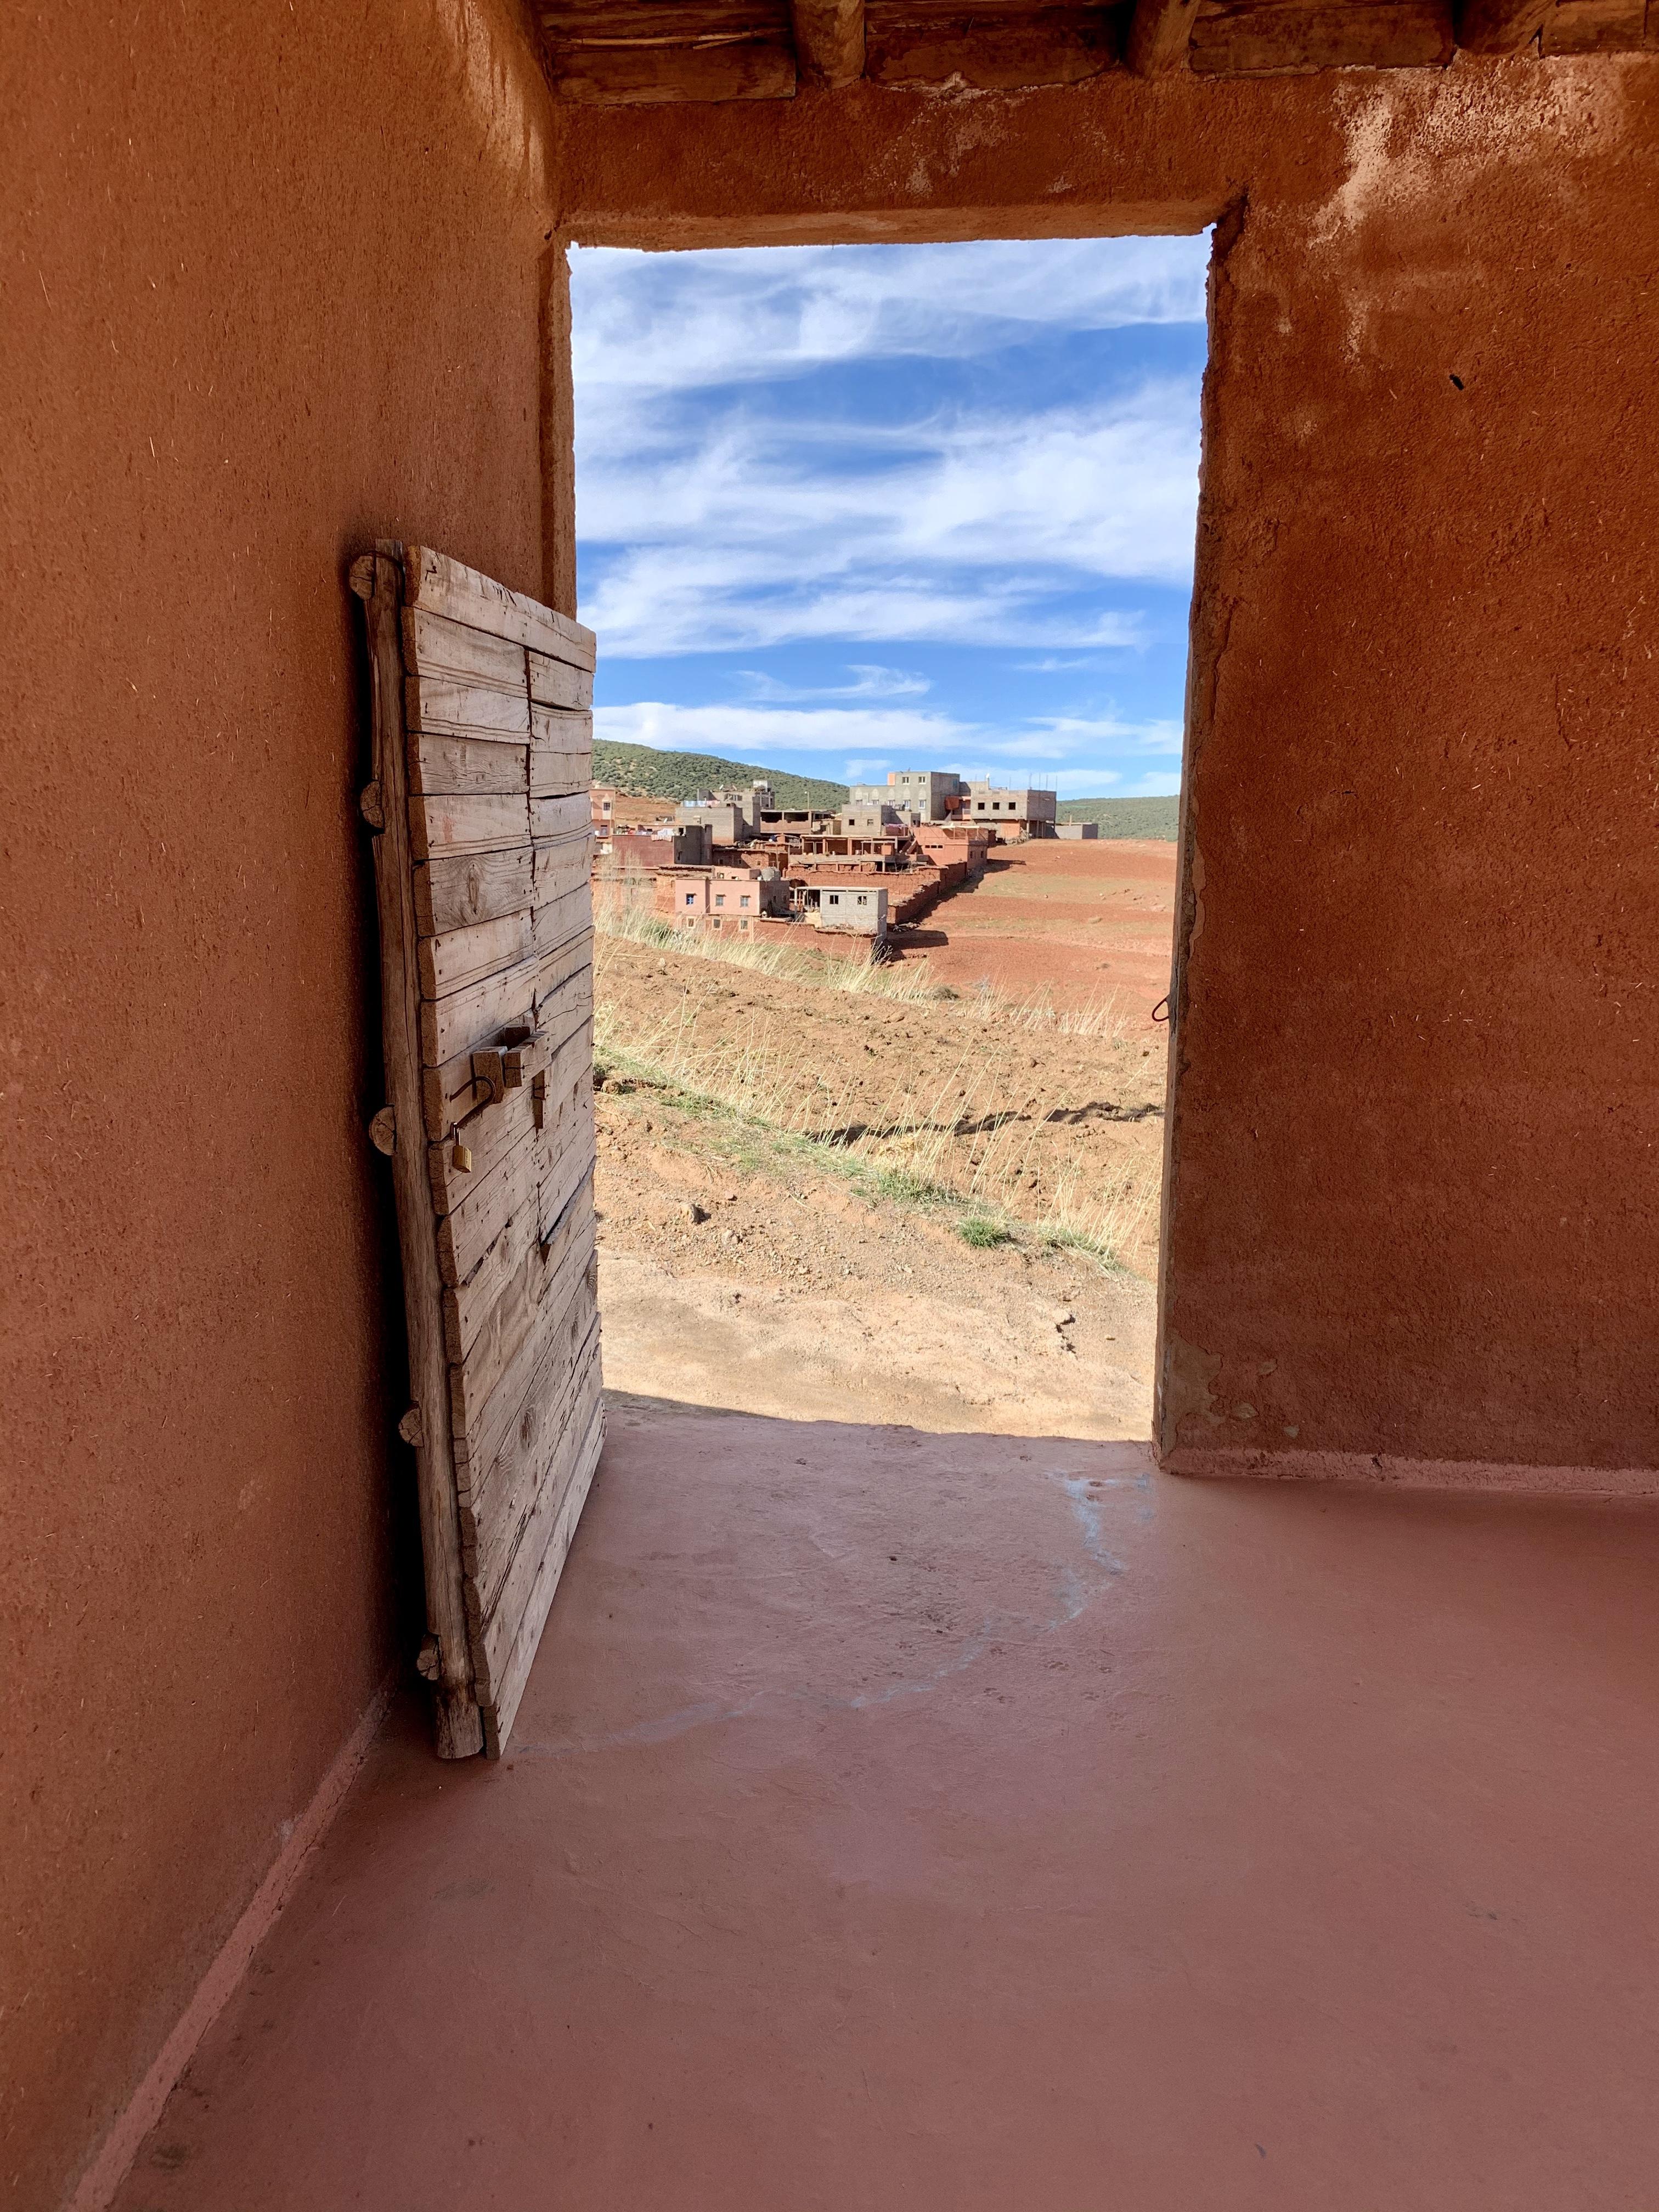 img 6531 - Marrakech, Morocco